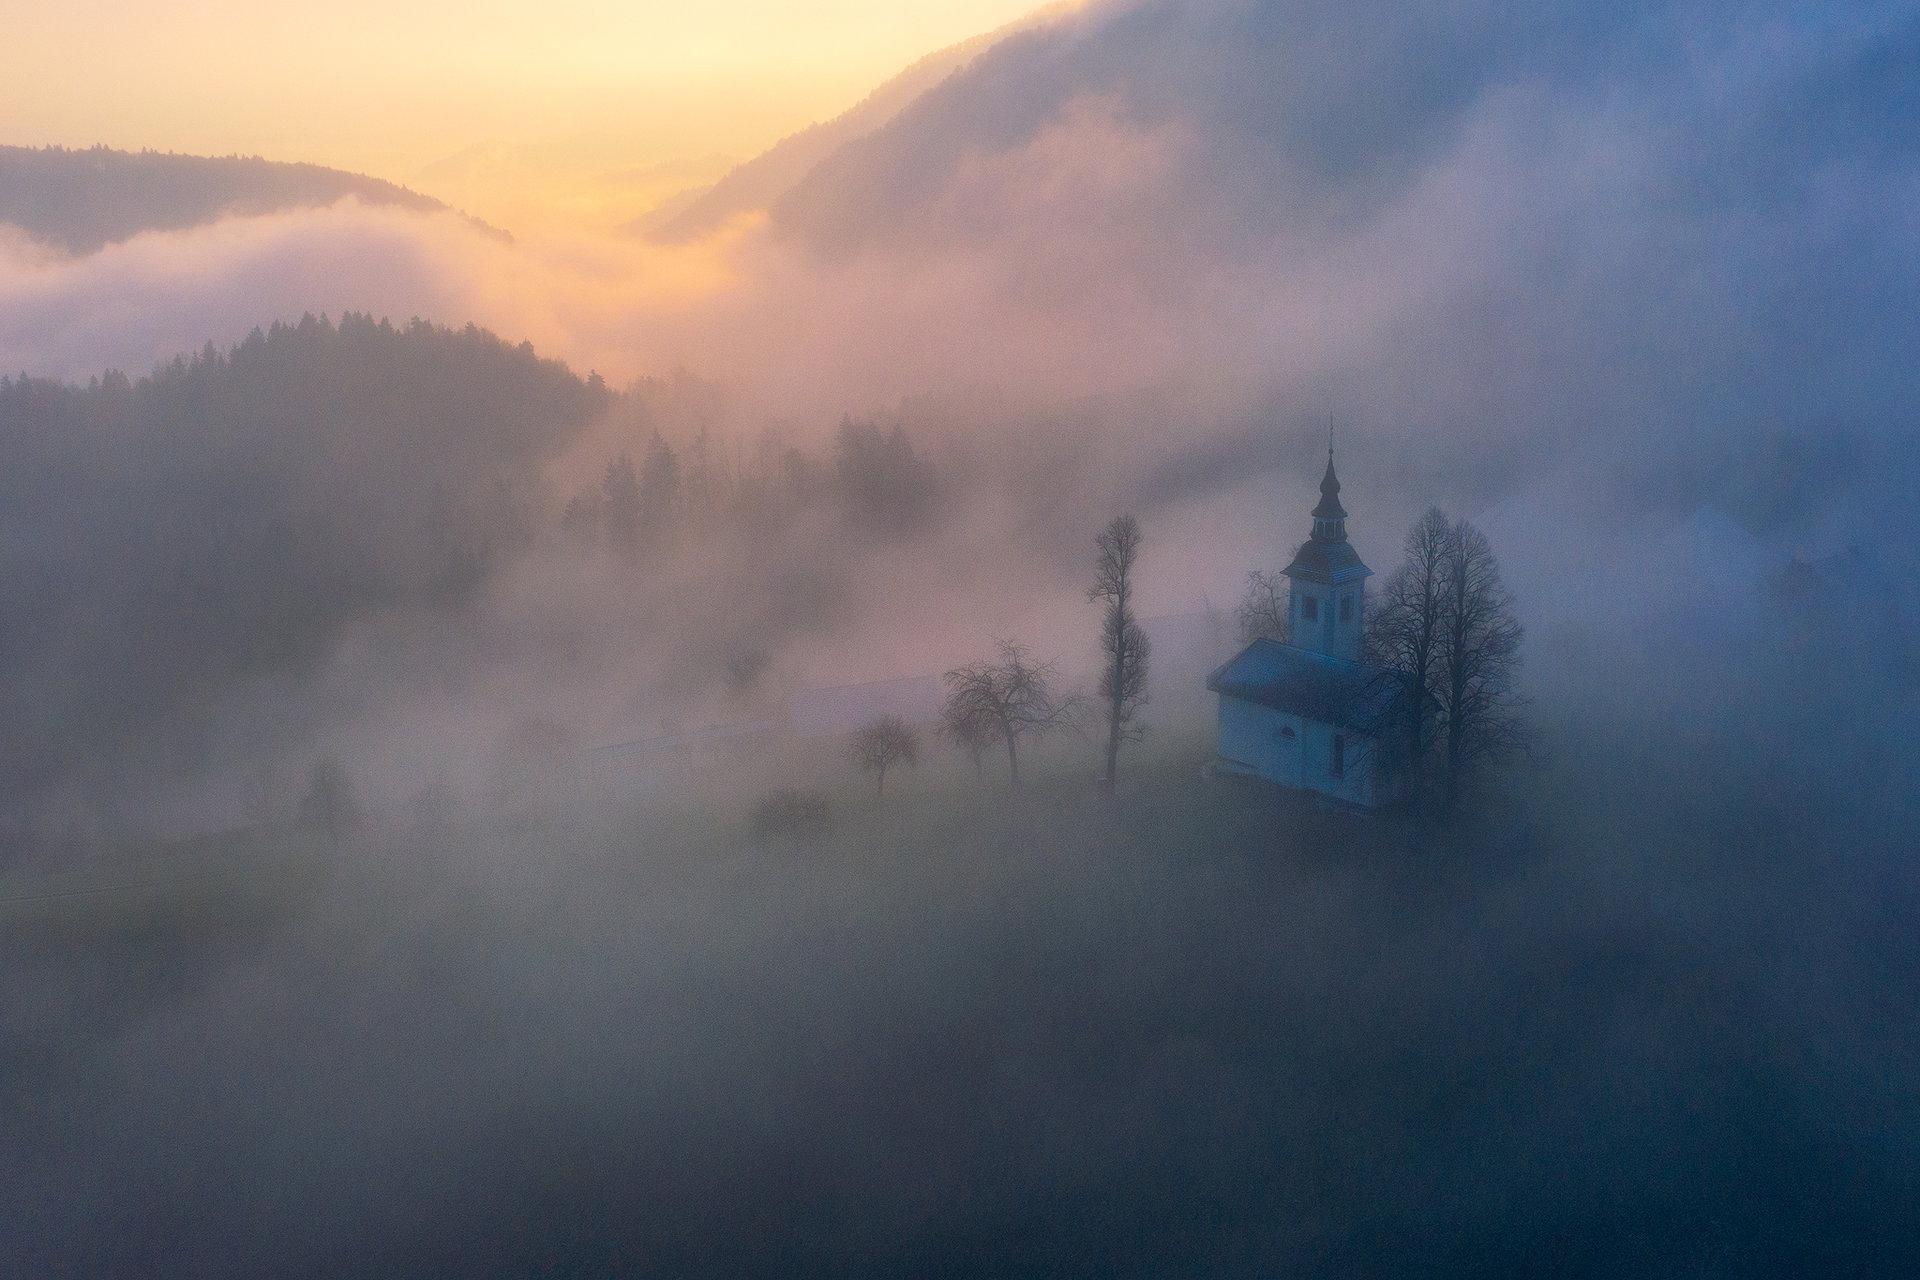 Photo in Landscape | Author wallburn | PHOTO FORUM